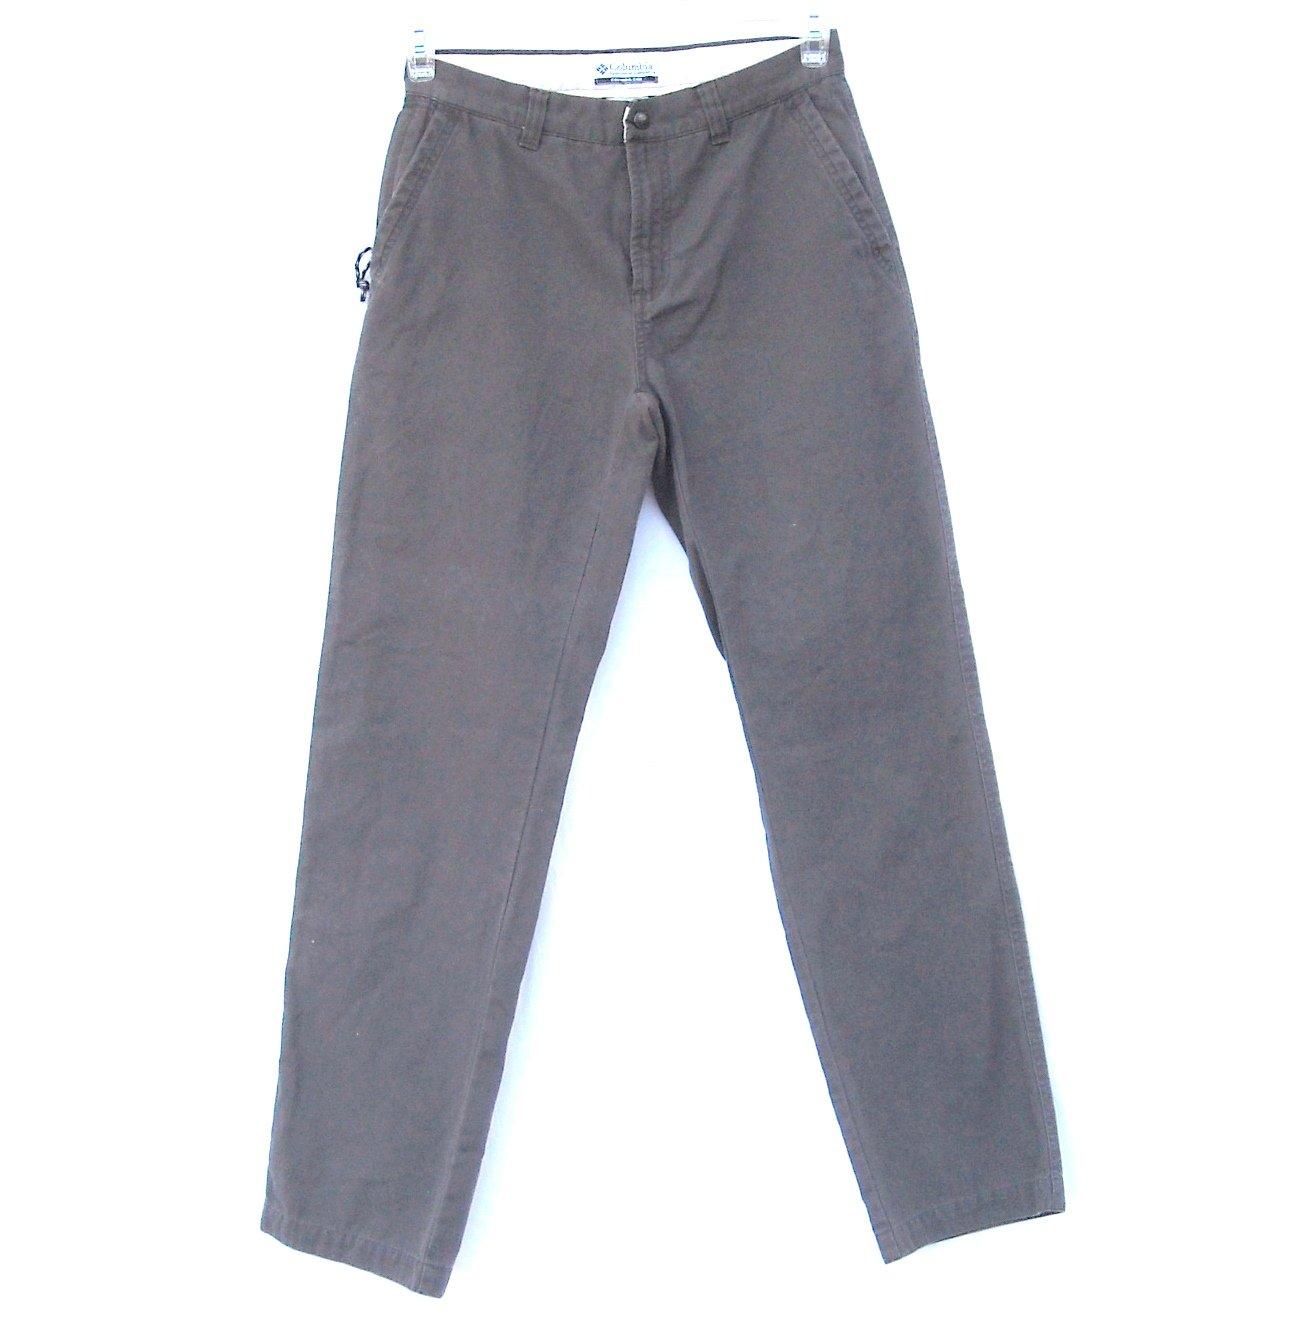 Columbia Sportswear Misses Womens Dark Pants Size 6